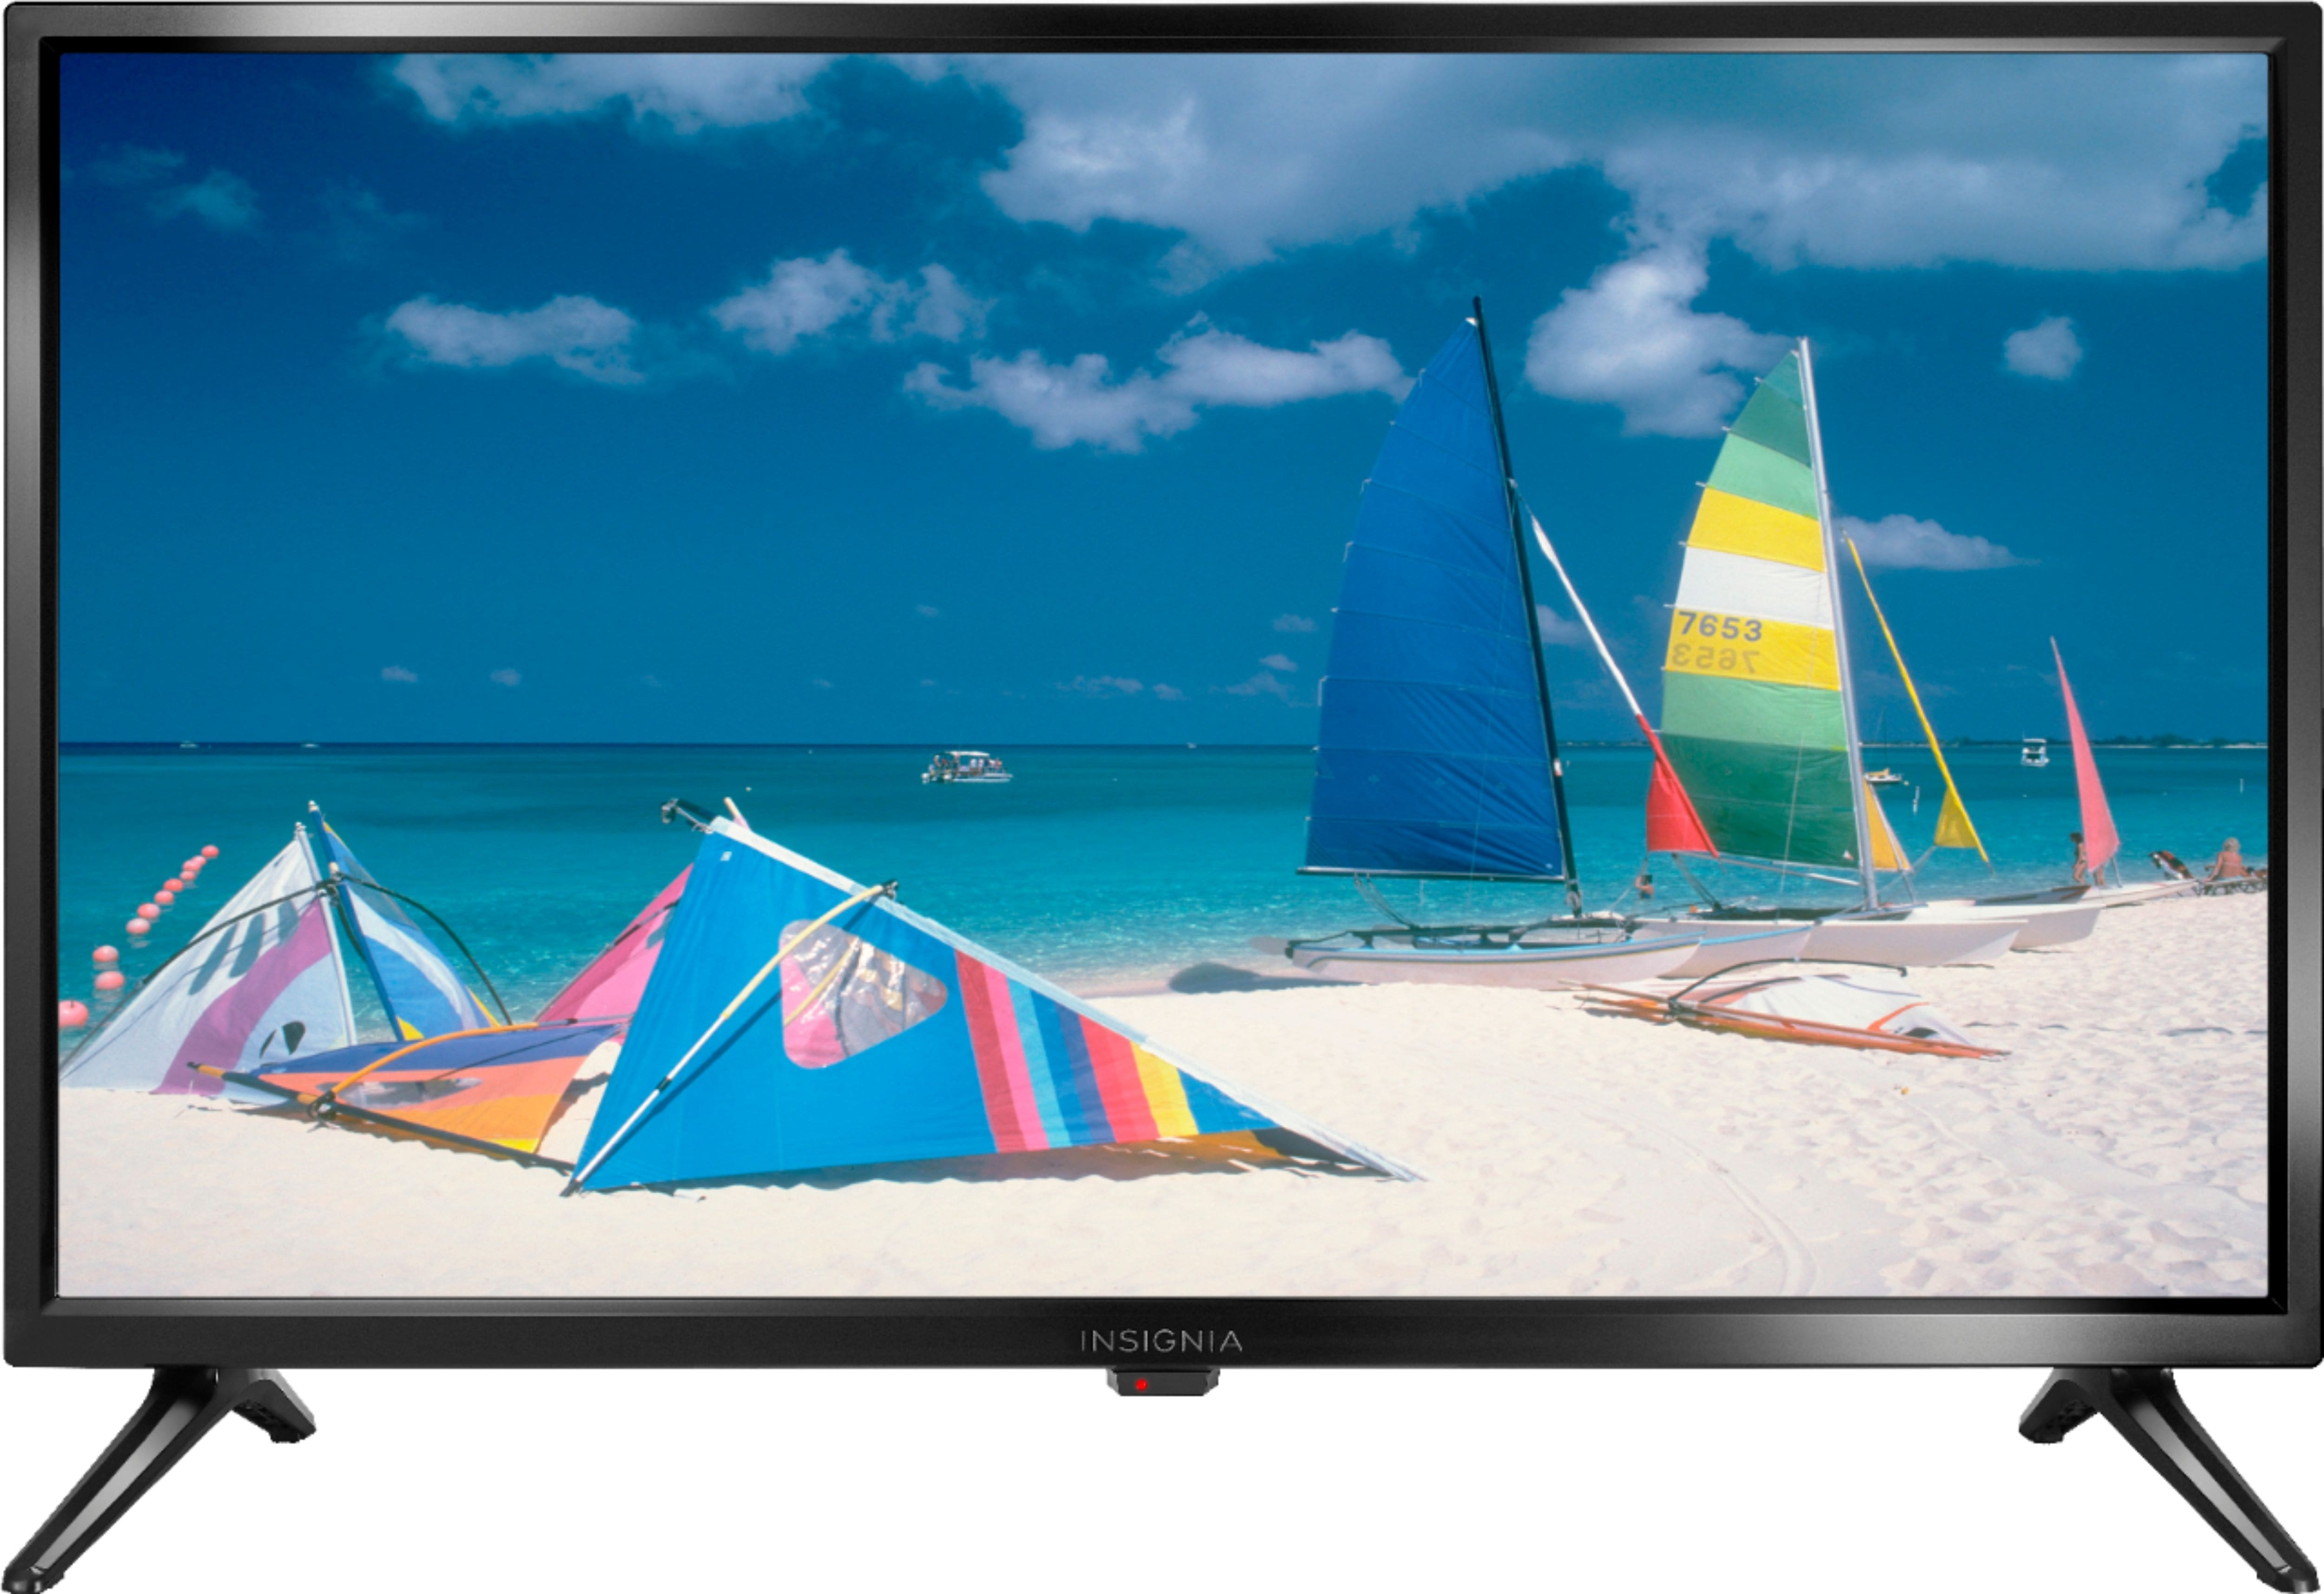 "Insignia™ - 40"" Class LED Full HD TV FOR $139.99+FS"